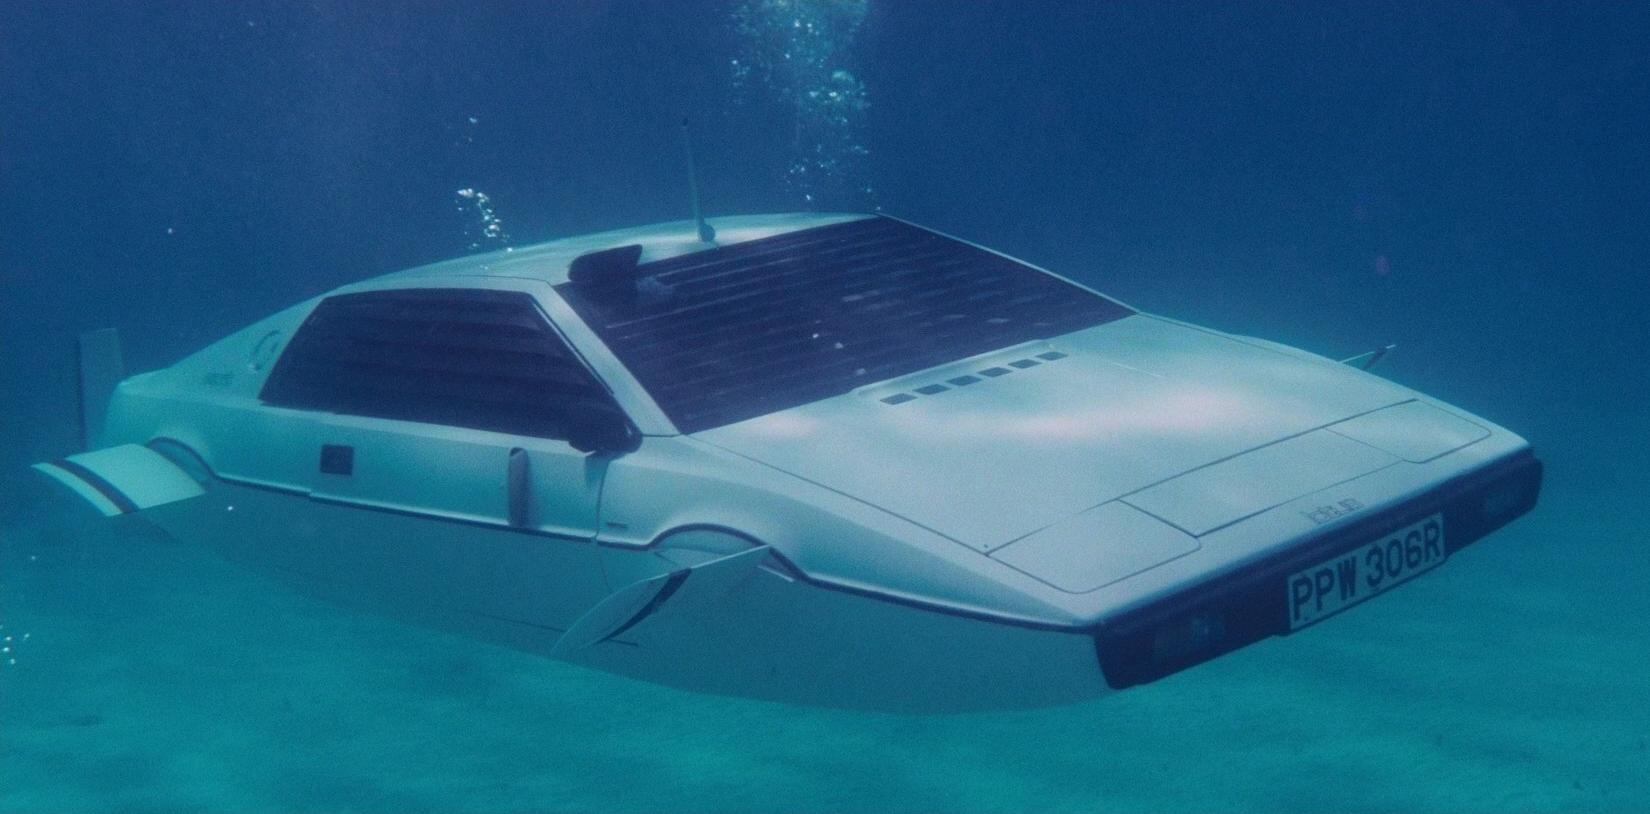 lotus_esprit_s1_submarine.jpg